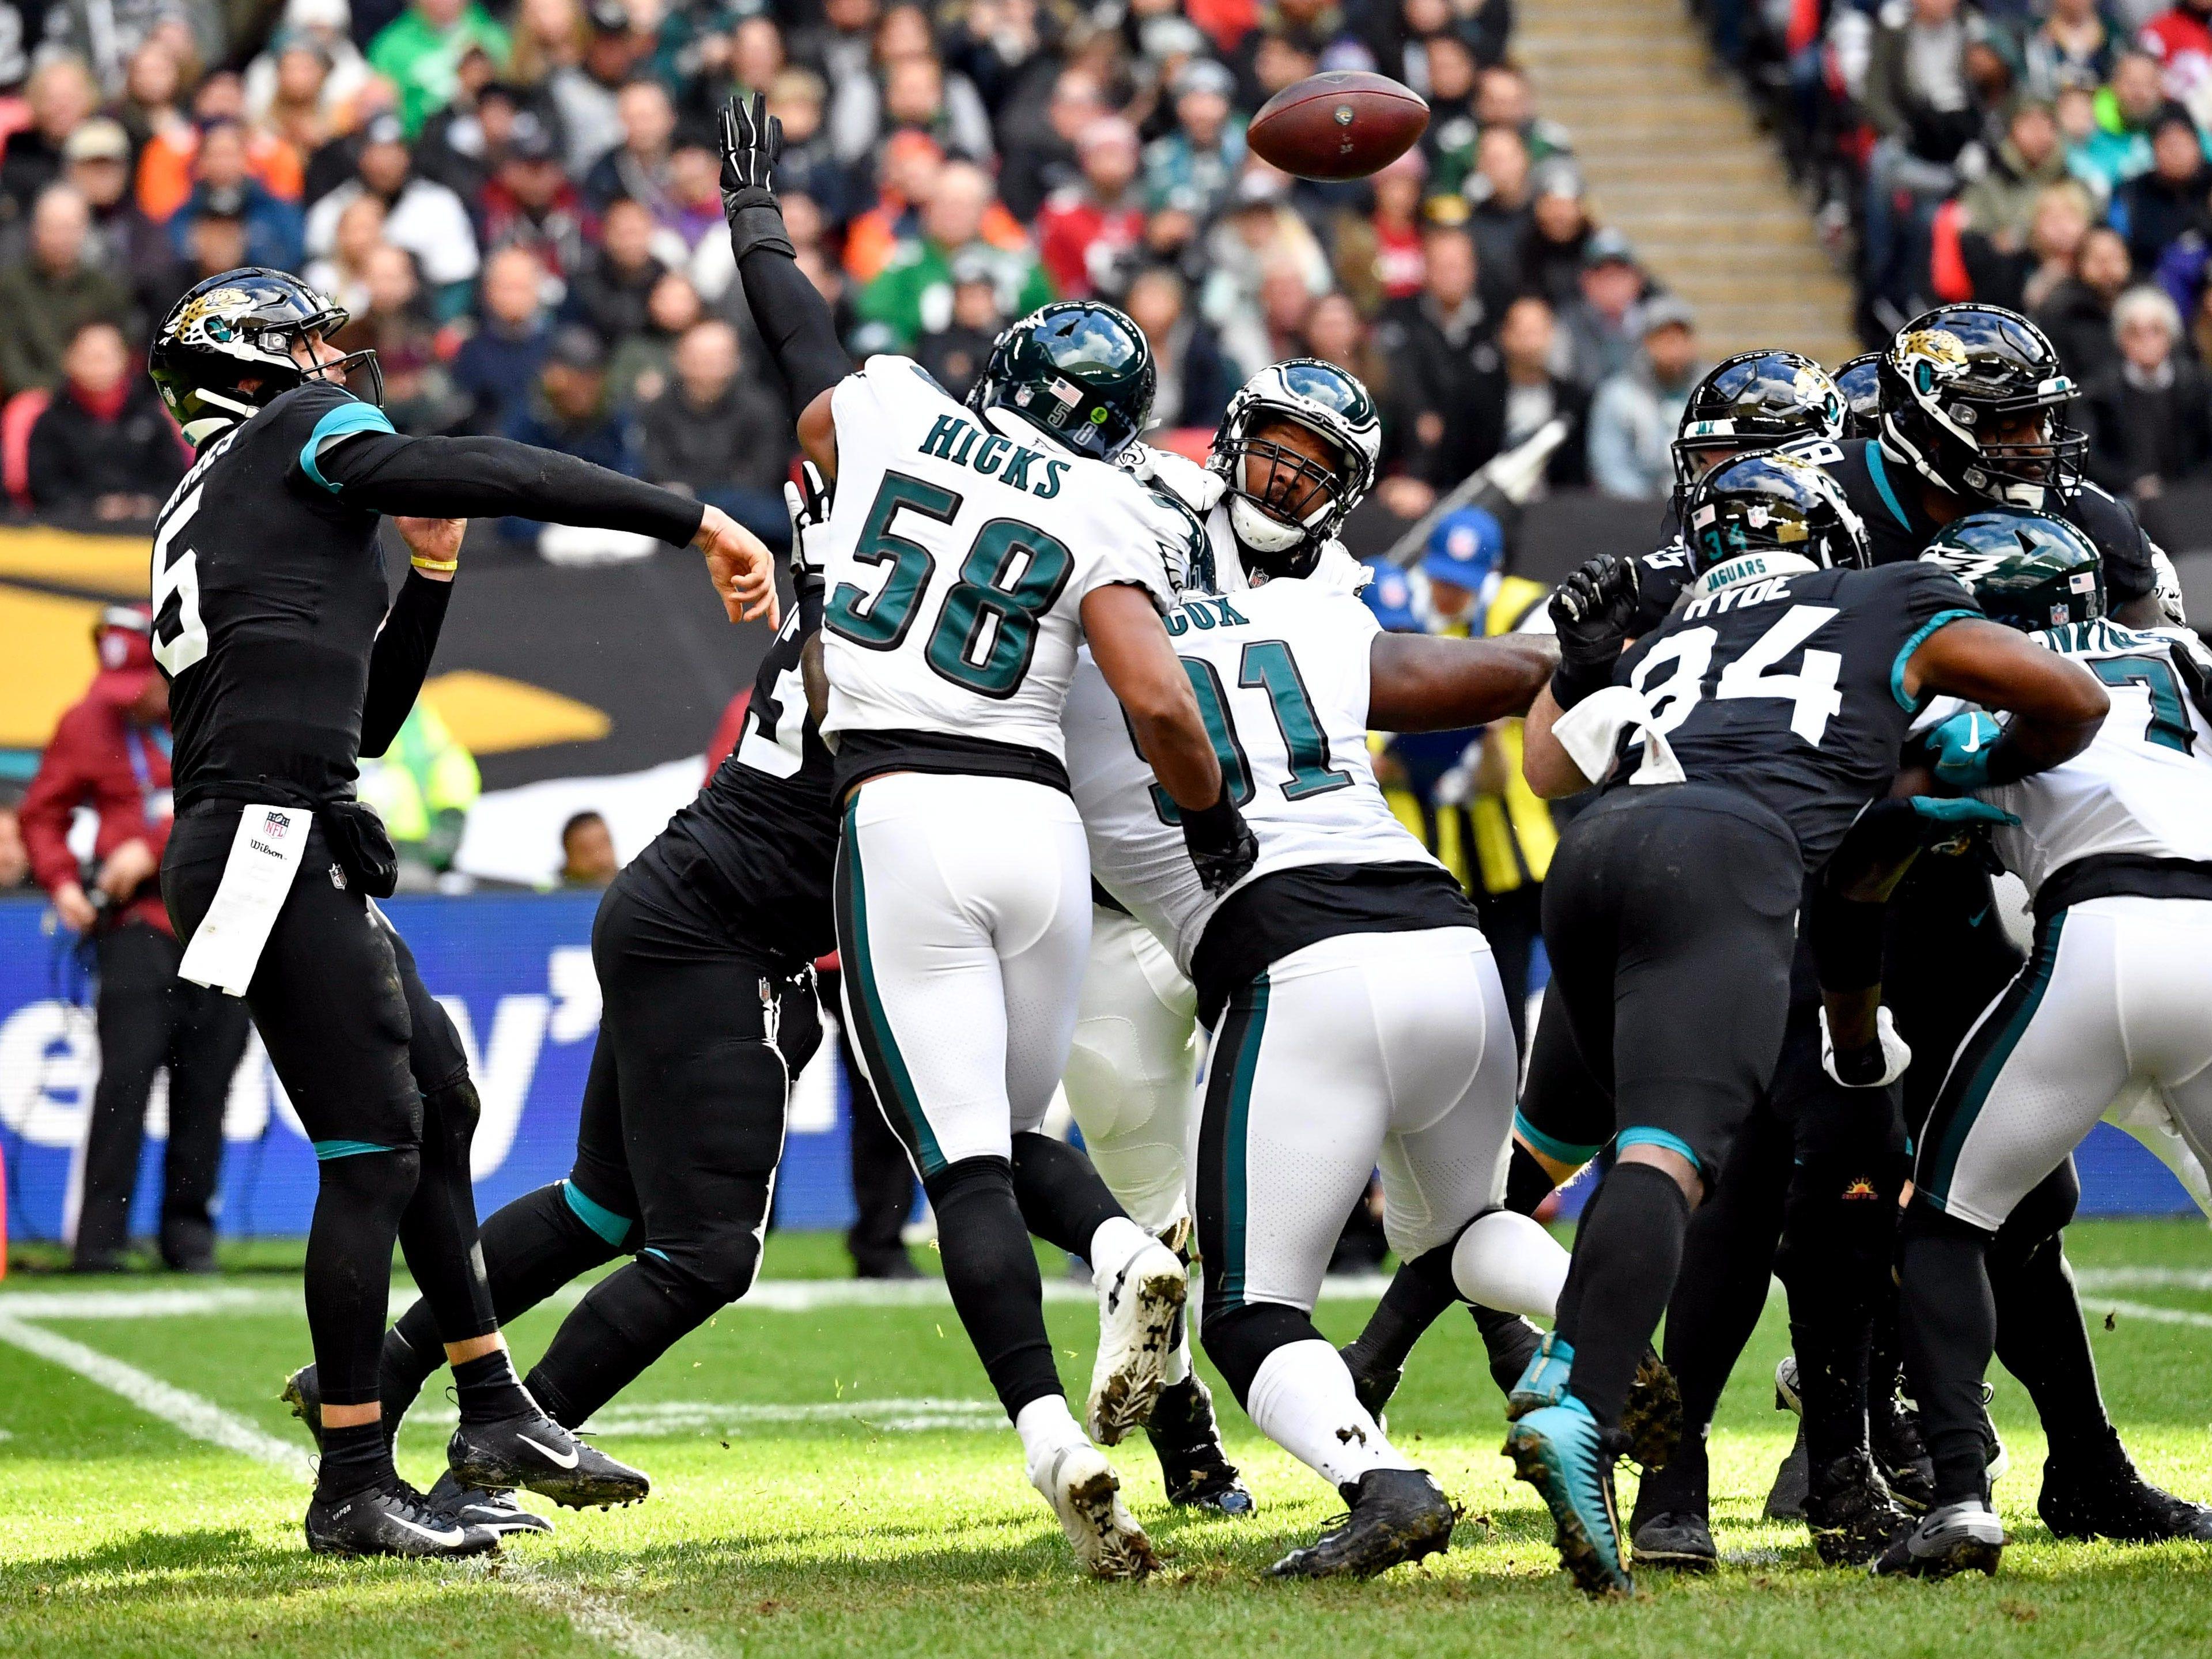 Jacksonville Jaguars quarterback Blake Bortles (5) throws under pressure from Philadelphia Eagles linebacker Jordan Hicks (58) during the first quarter at Wembley Stadium.